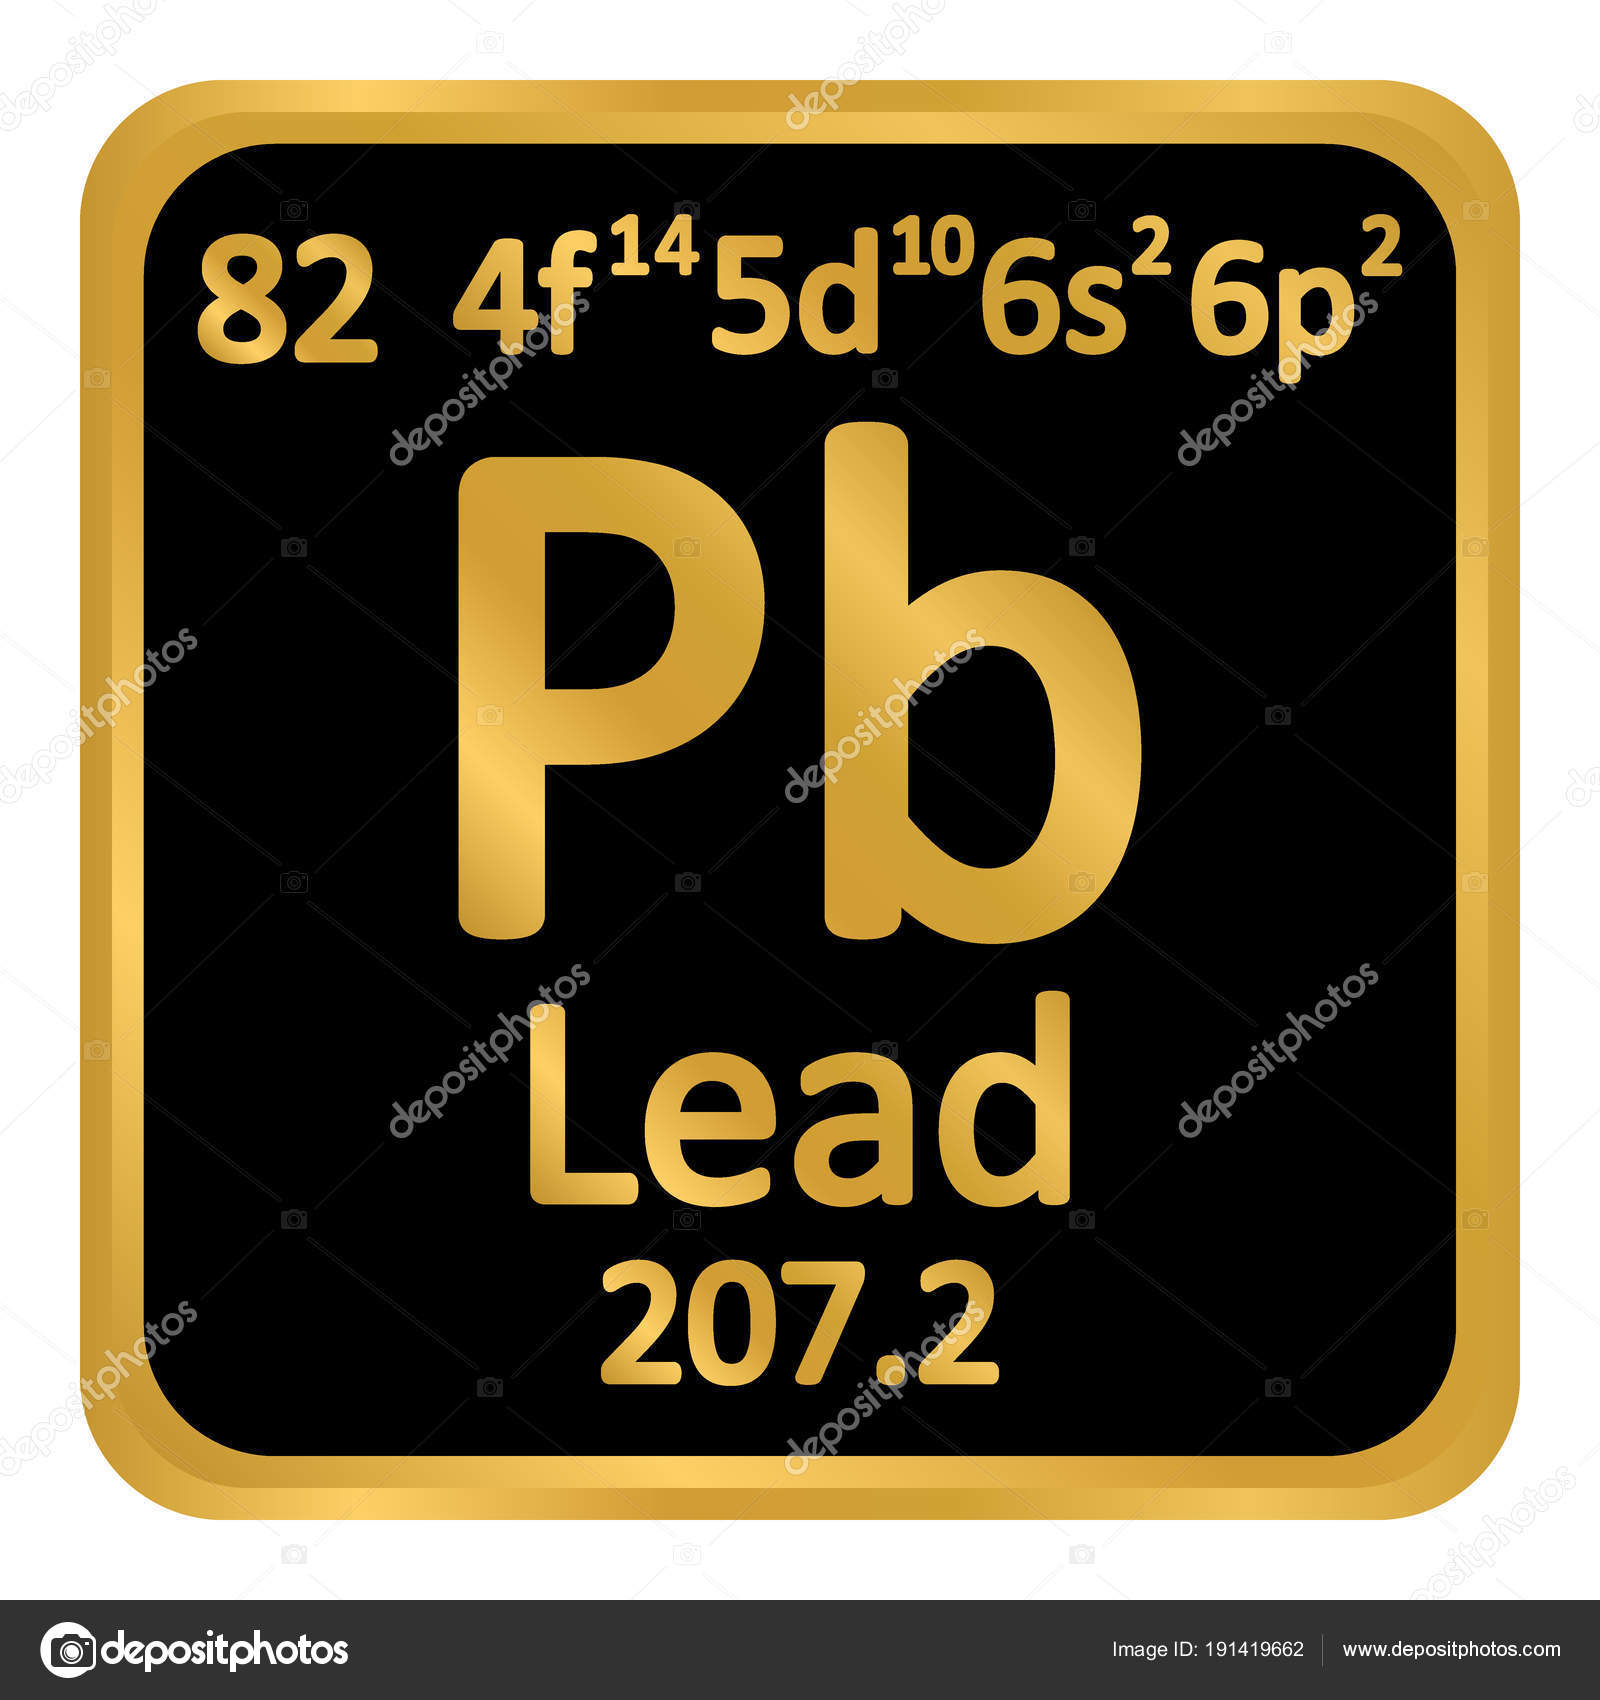 Periodic table element lead icon stock vector konstsem 191419662 periodic table element lead icon stock vector urtaz Choice Image